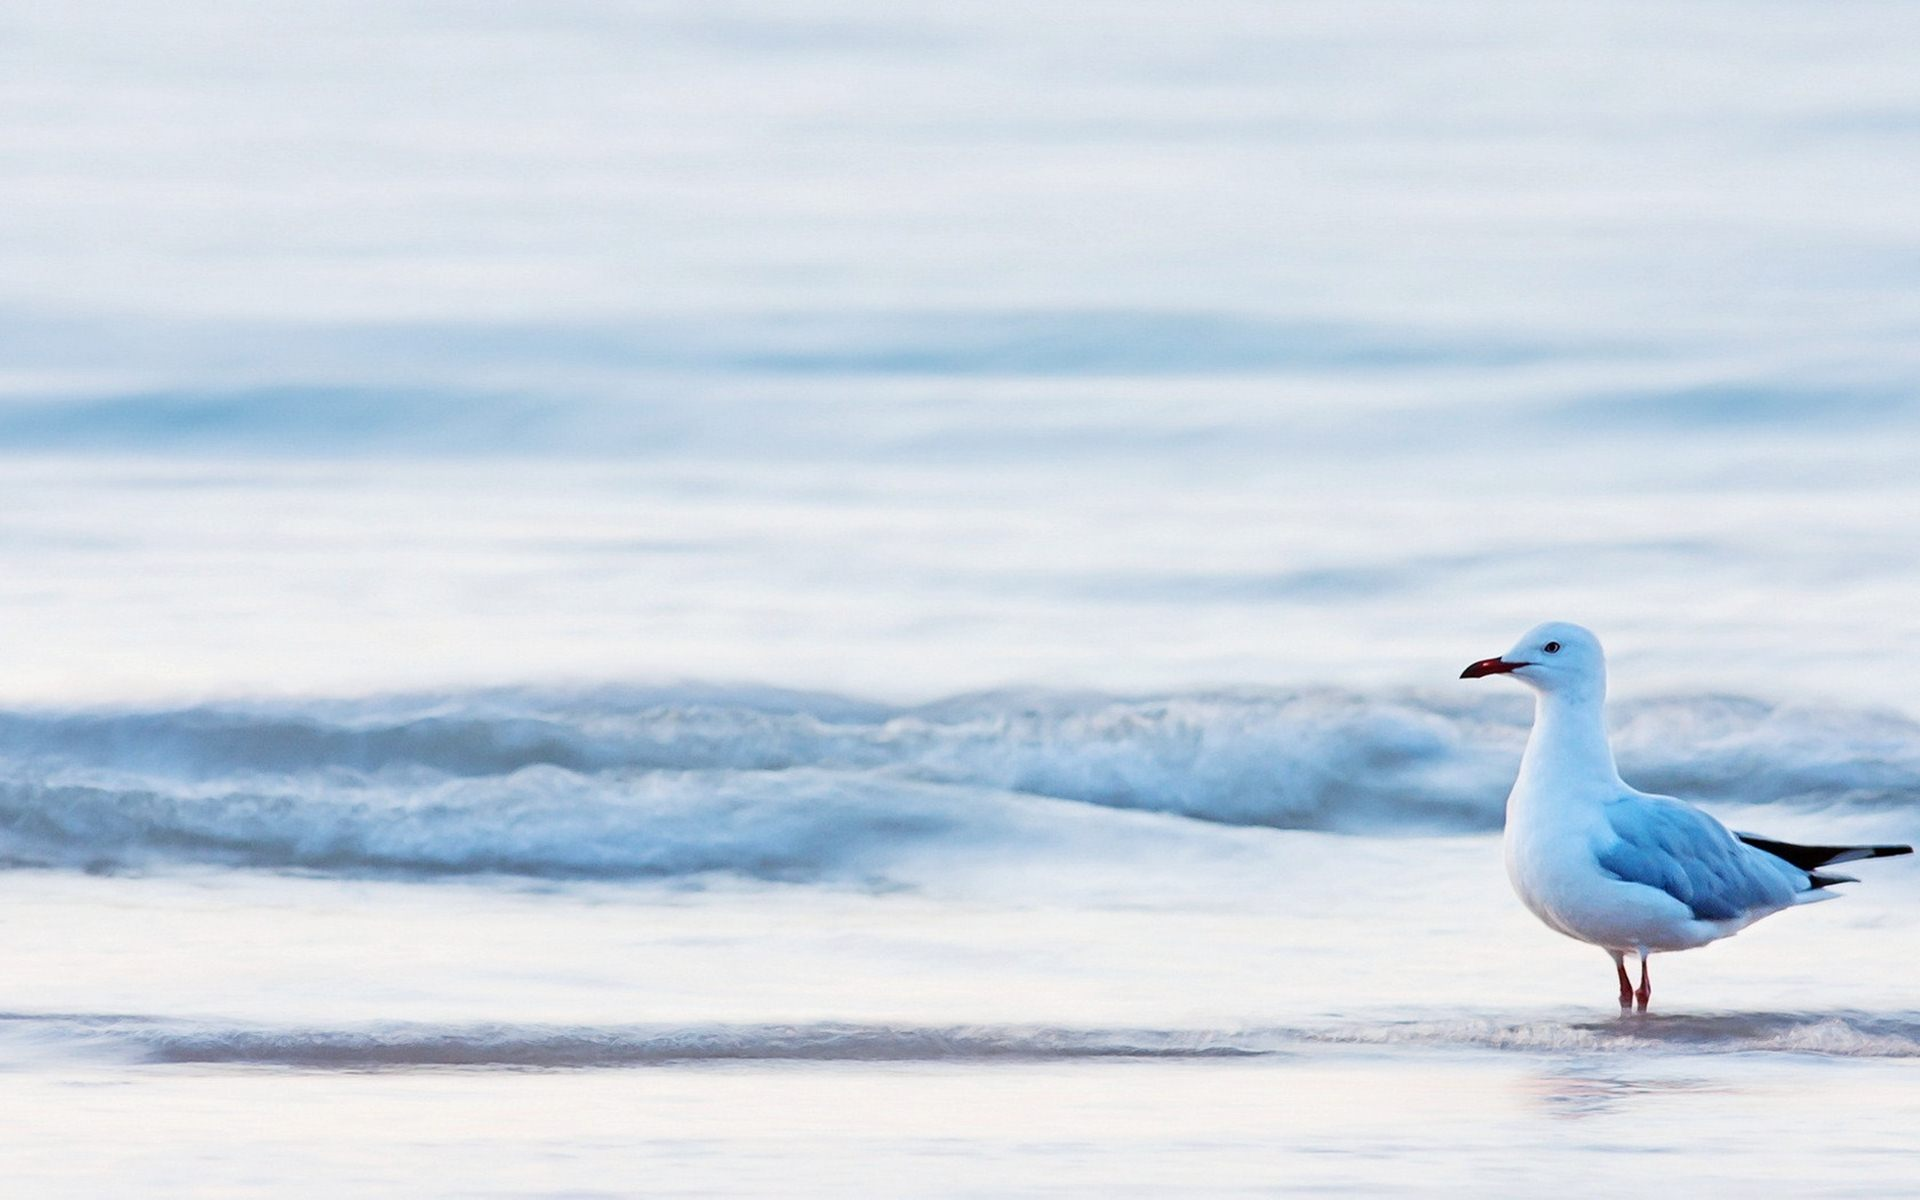 cute seagulls wallpaper 30690